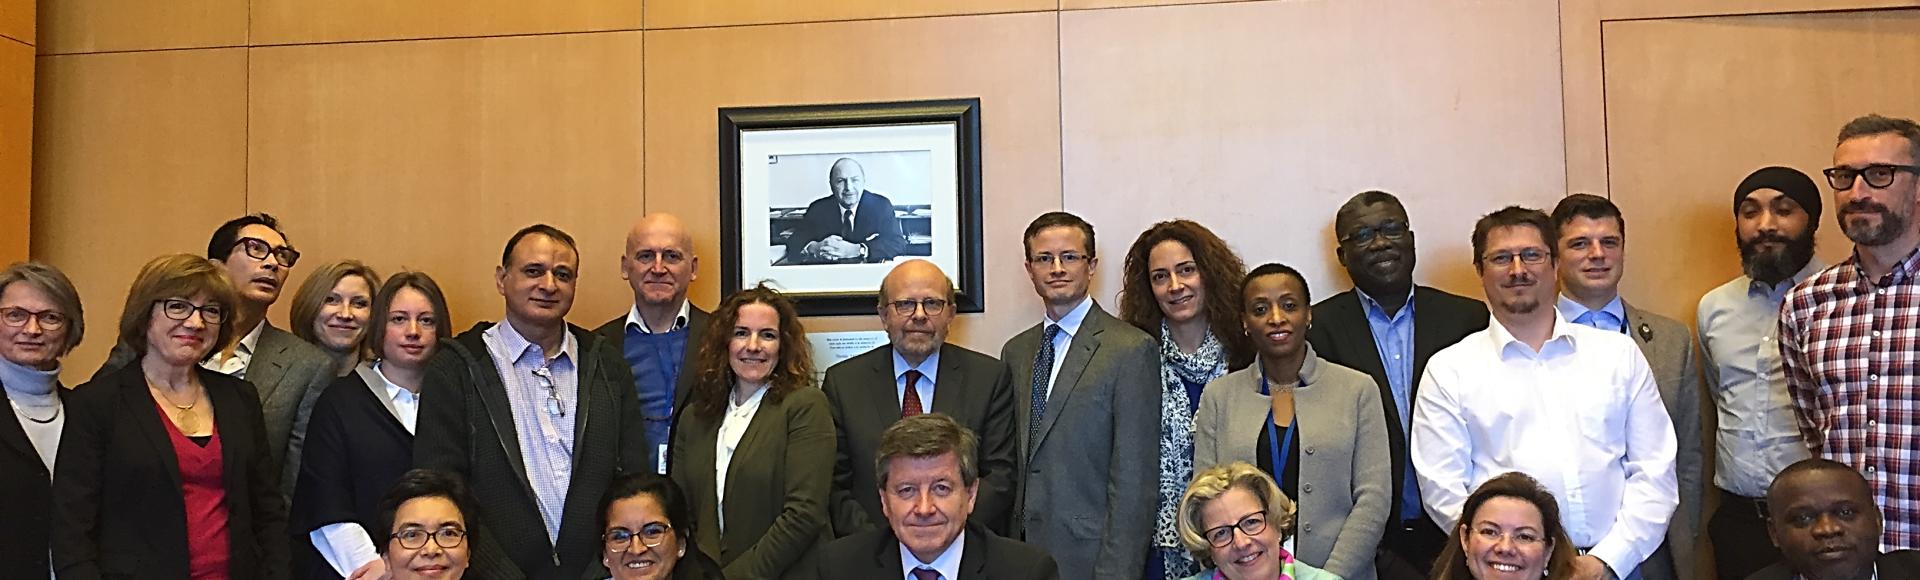 El Director General se reunió con el Comité del Sindicato del personal